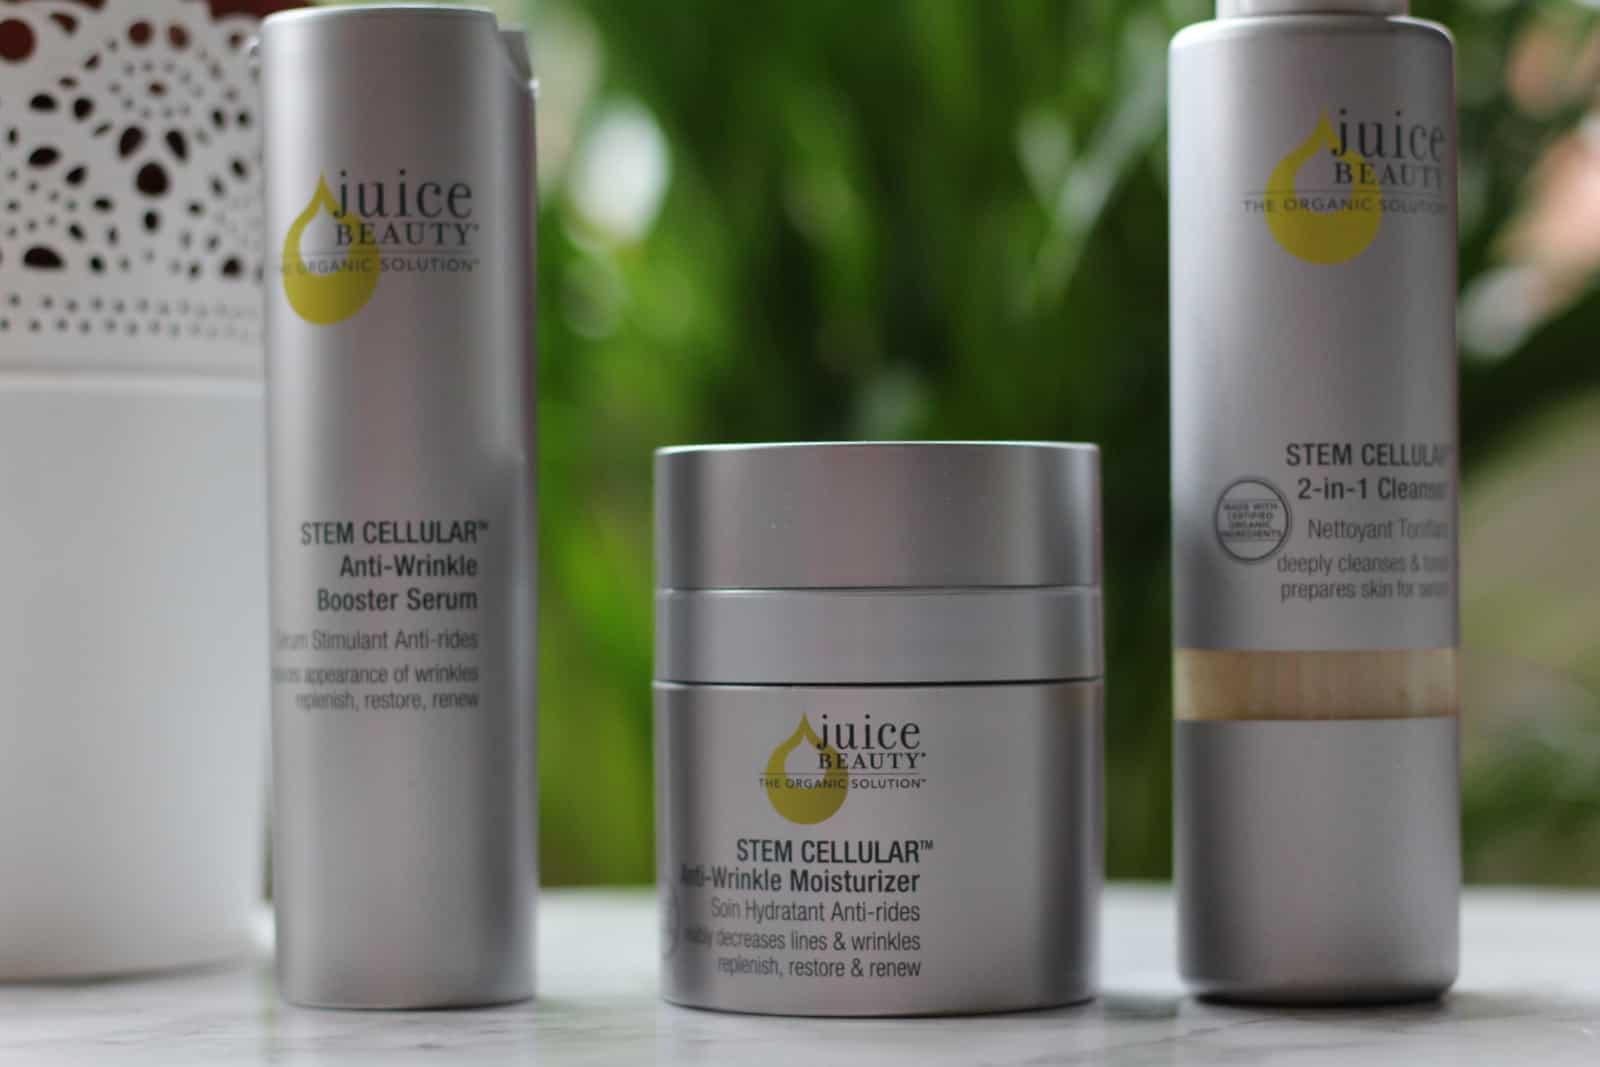 Juice Beauty – brand no animal testing